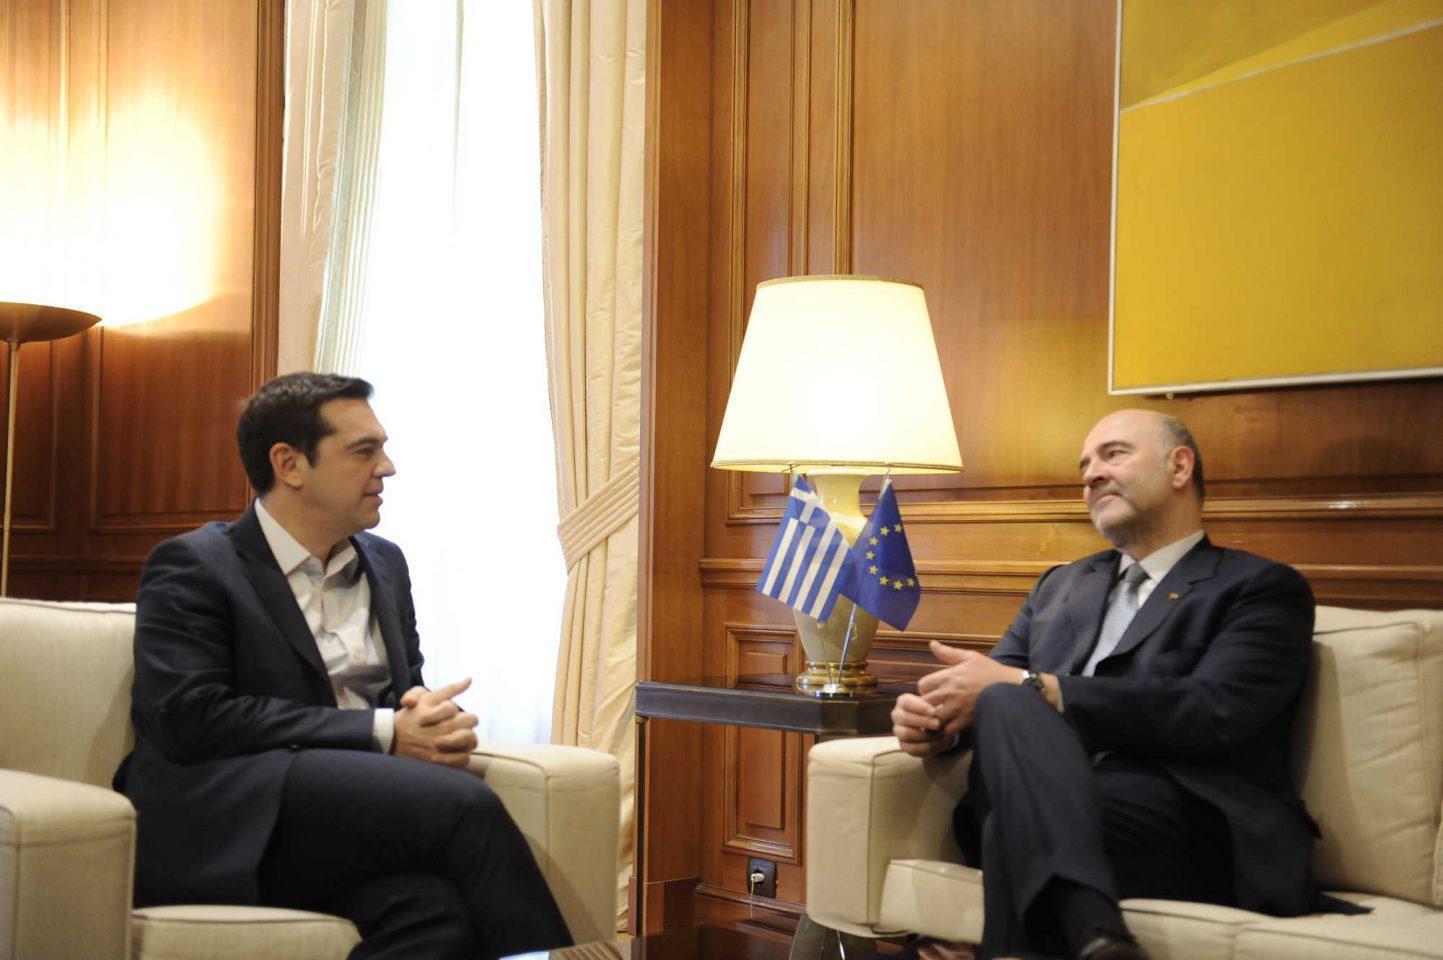 tsipras-moskovici-maximou-synantisi-1300 Τσίπρας σε Μοσκοβισί: Το μήνυμα είναι «φτάνει πια η λιτότητα στην Ελλάδα»